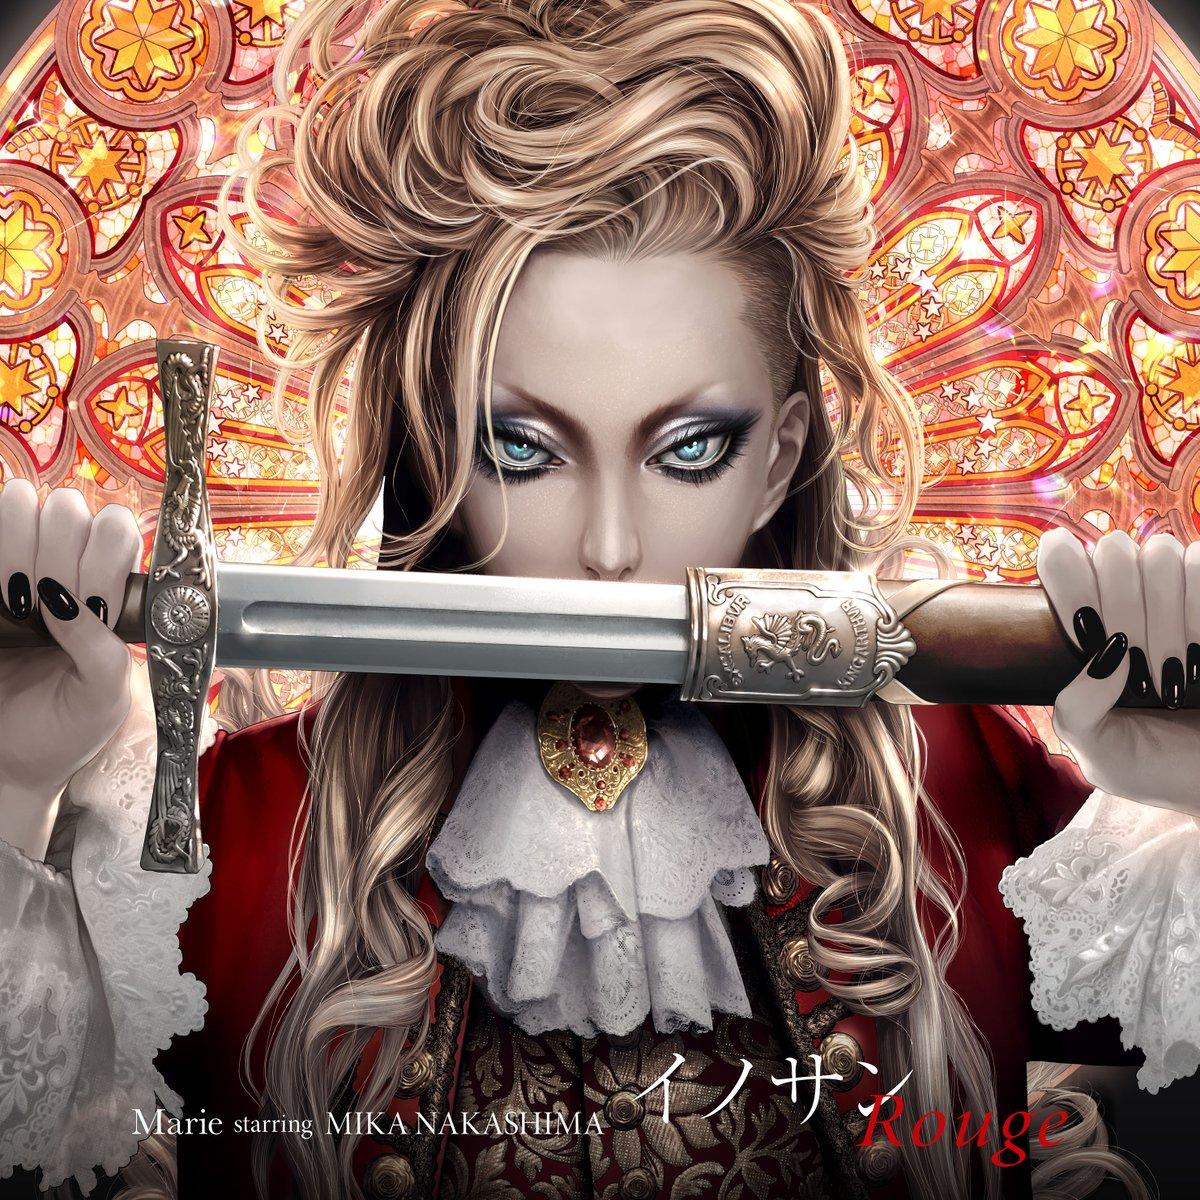 『Marie starring MIKA NAKASHIMA - 無垢なるもの』収録の『イノサンRouge』ジャケット